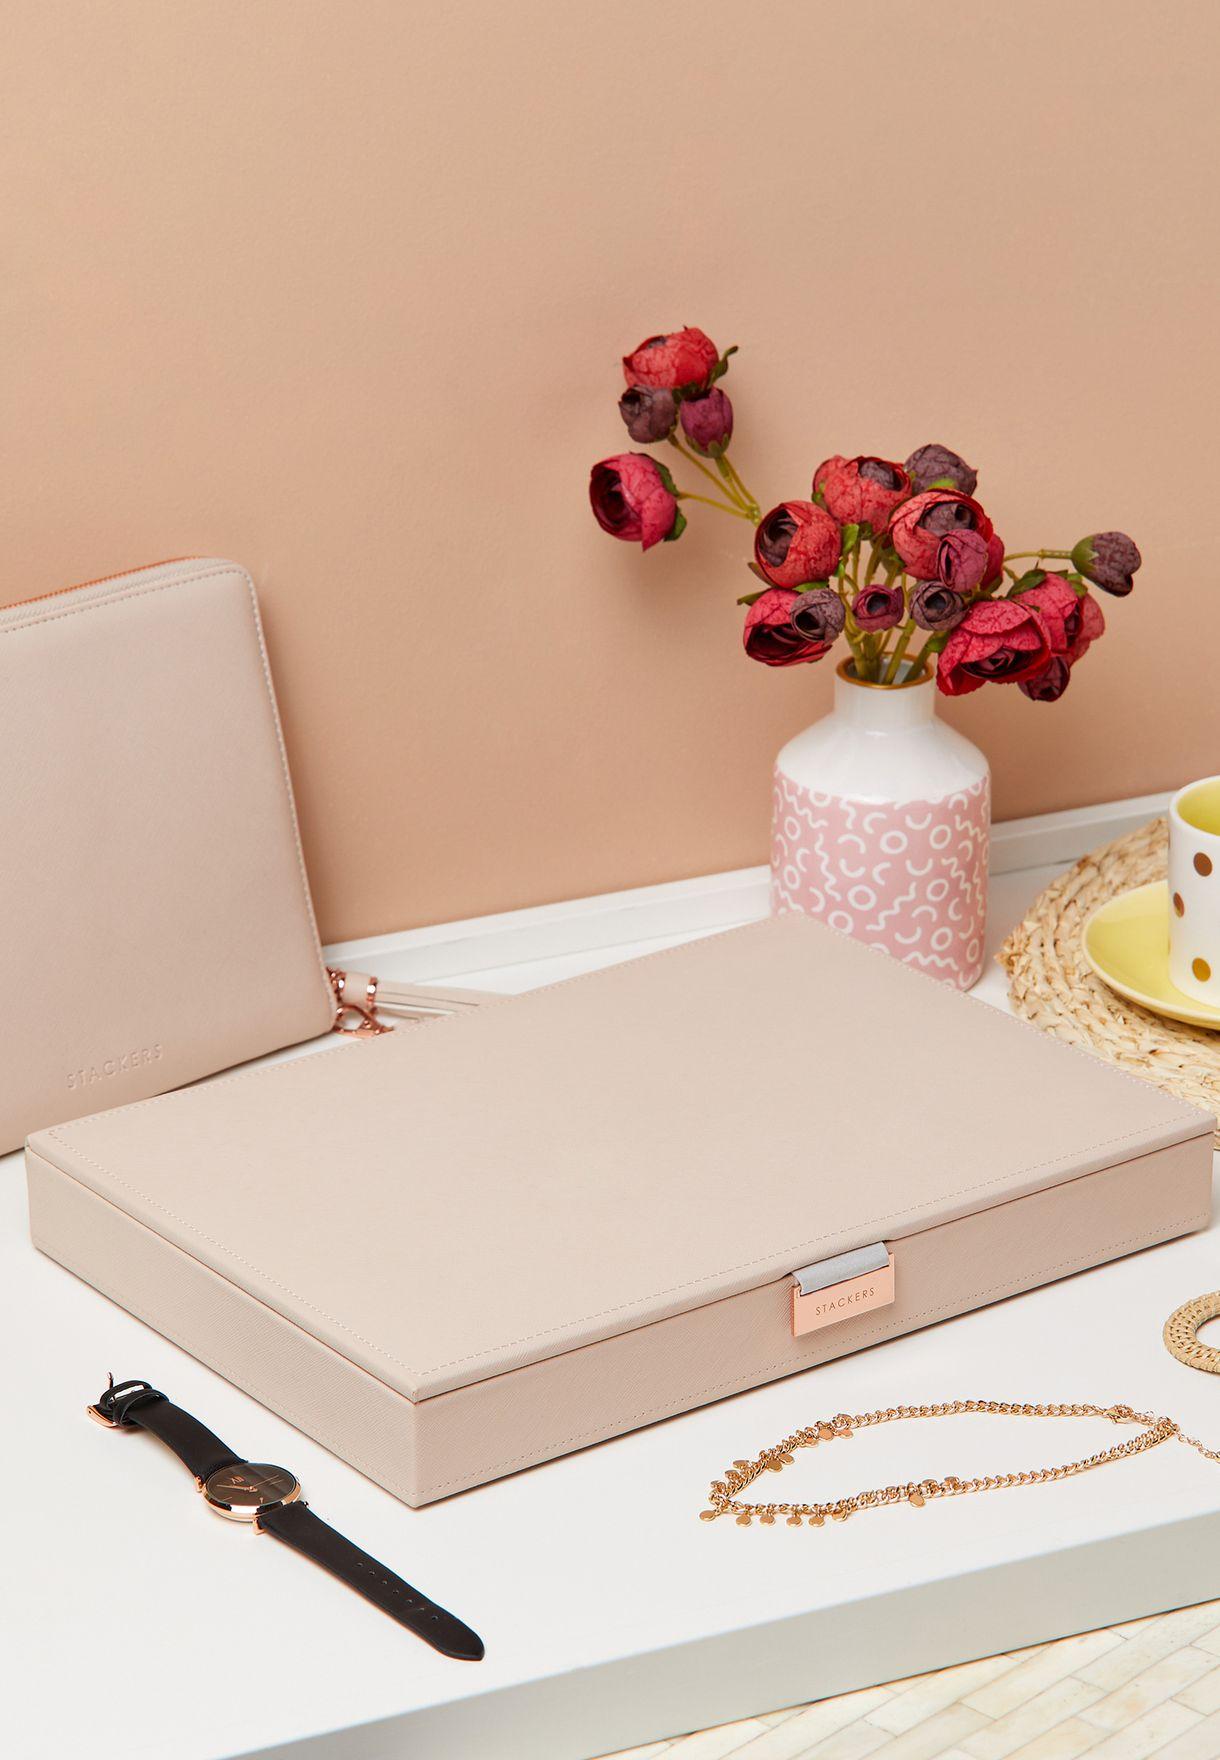 Supersize Jewellery Box Lid